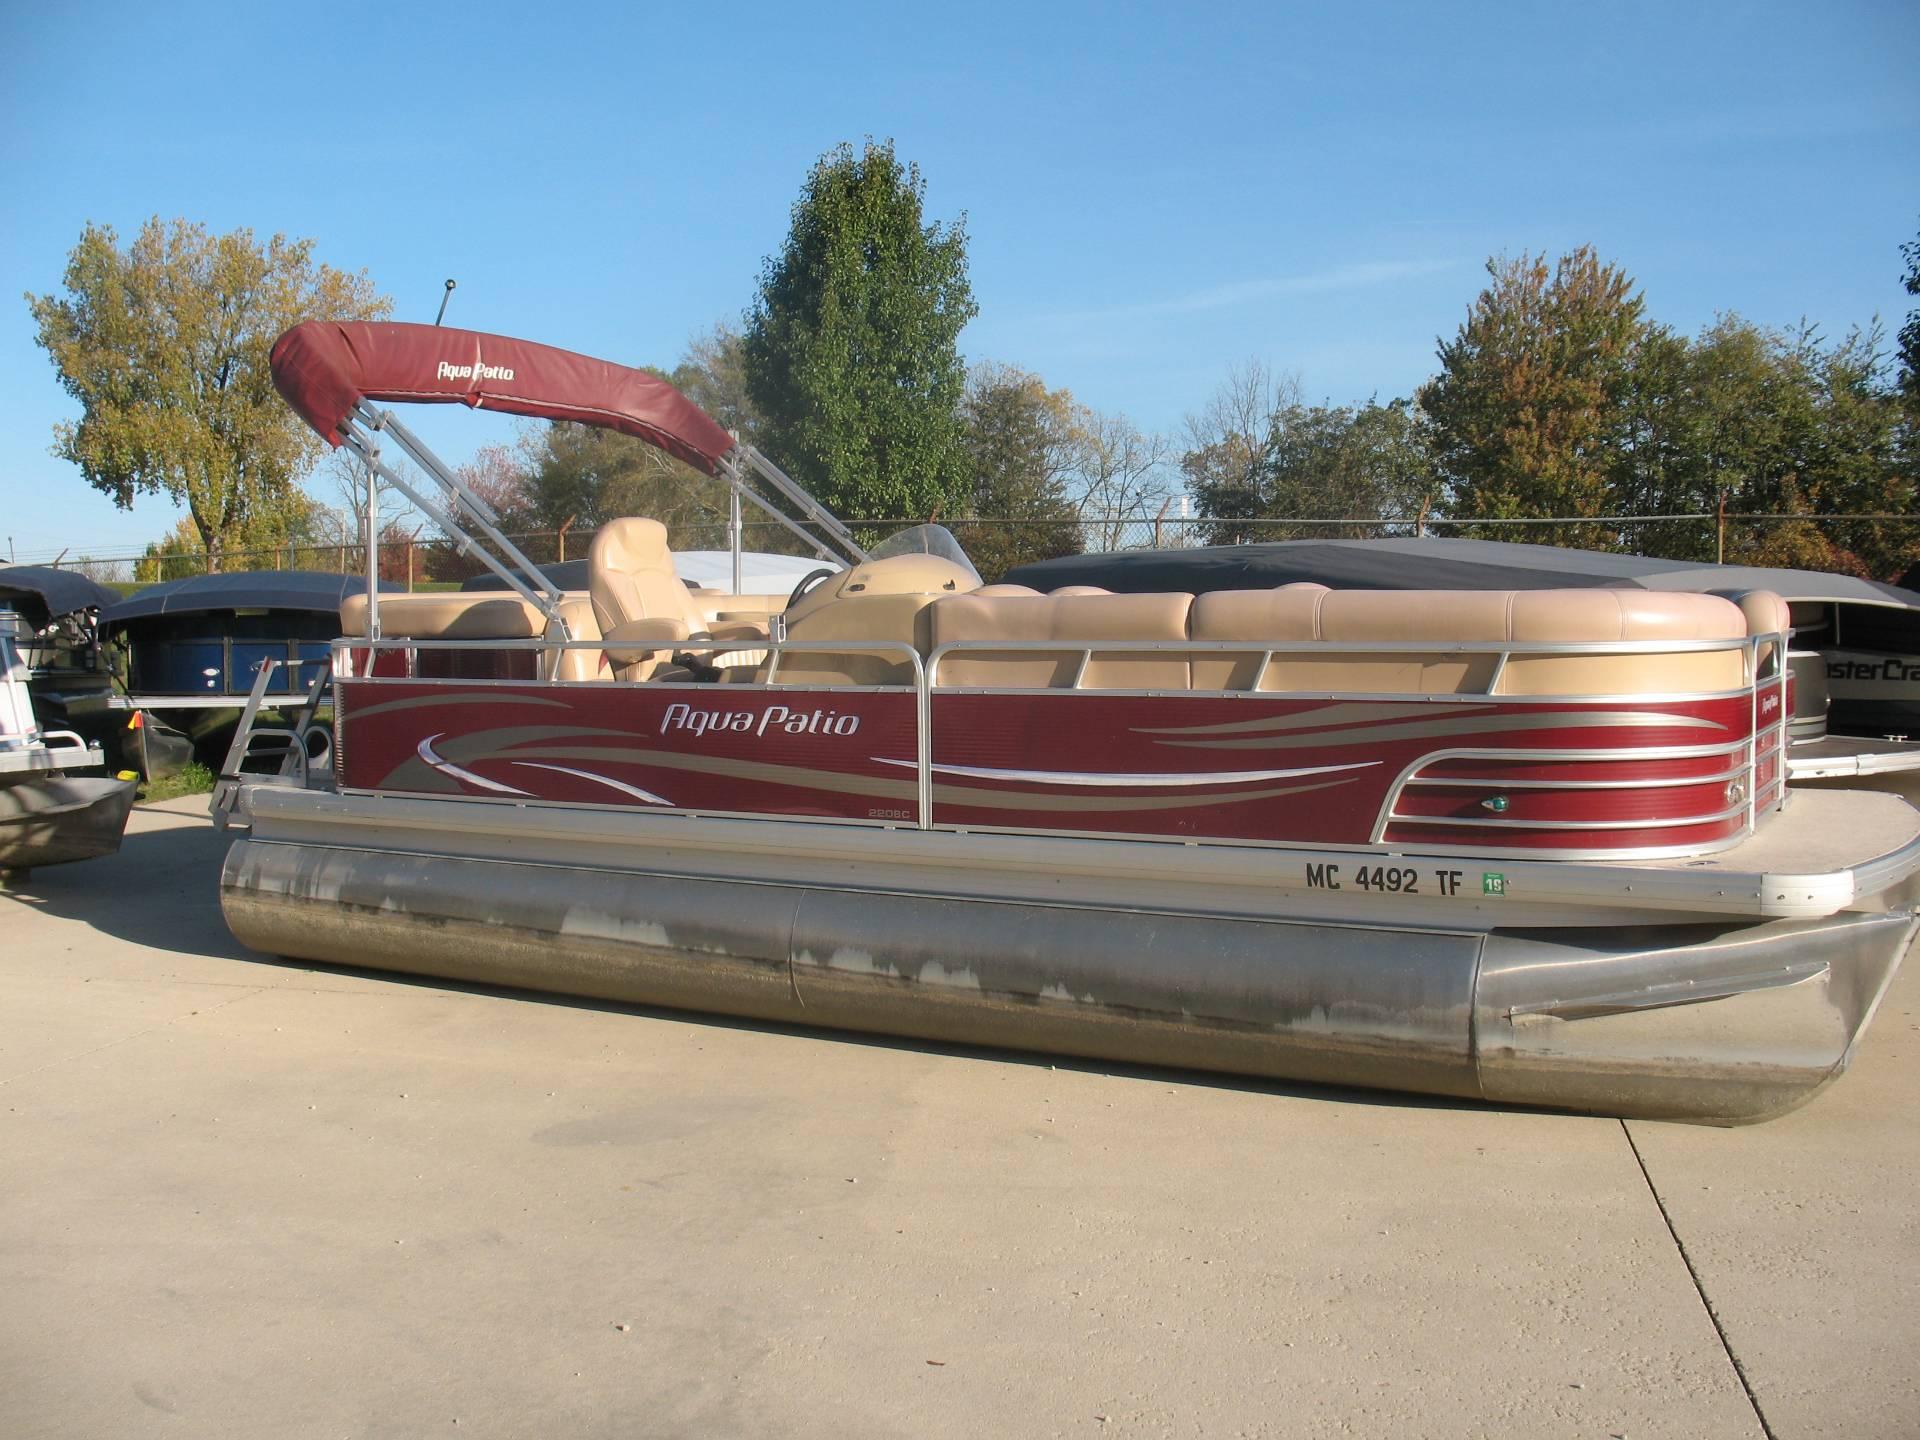 2009 Aqua Patio 220 BC Power Boats Outboard Manitou Beach Michigan N A